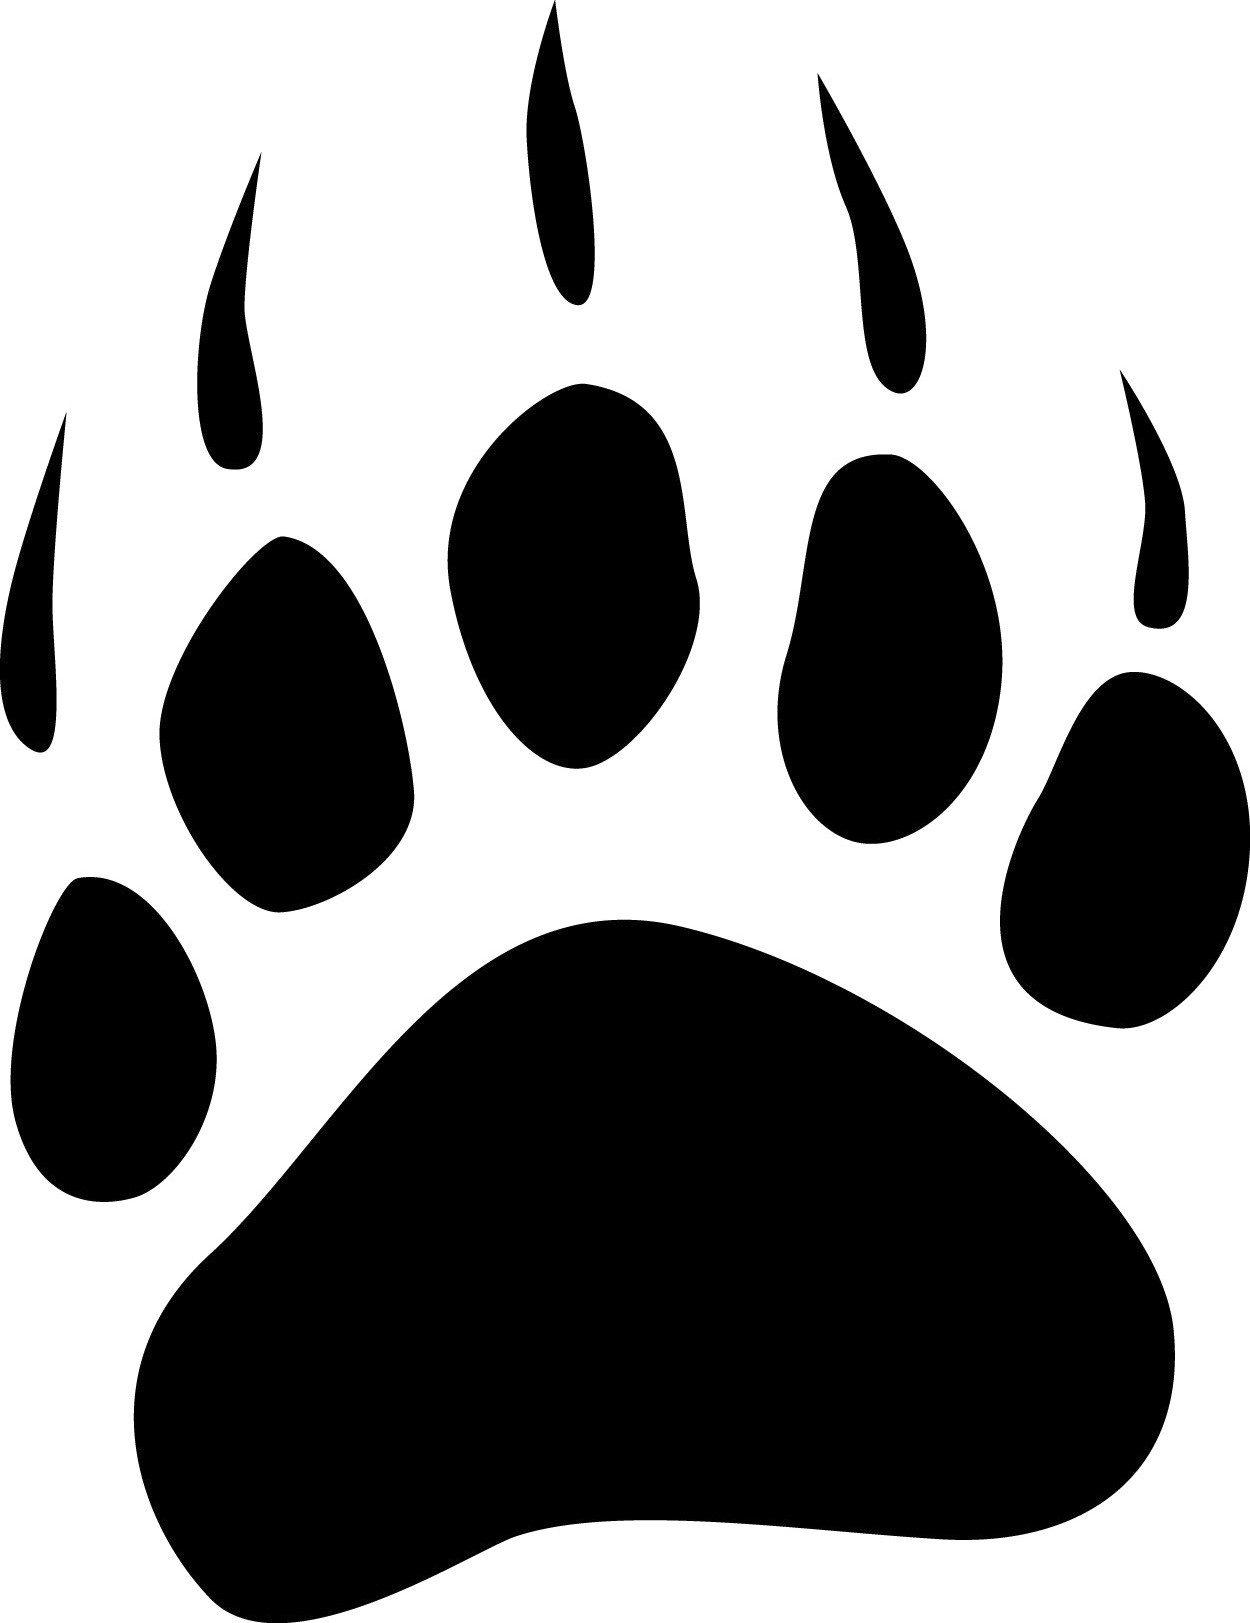 1250x1623 Bear Paw Print Clip Art Many Interesting Cliparts